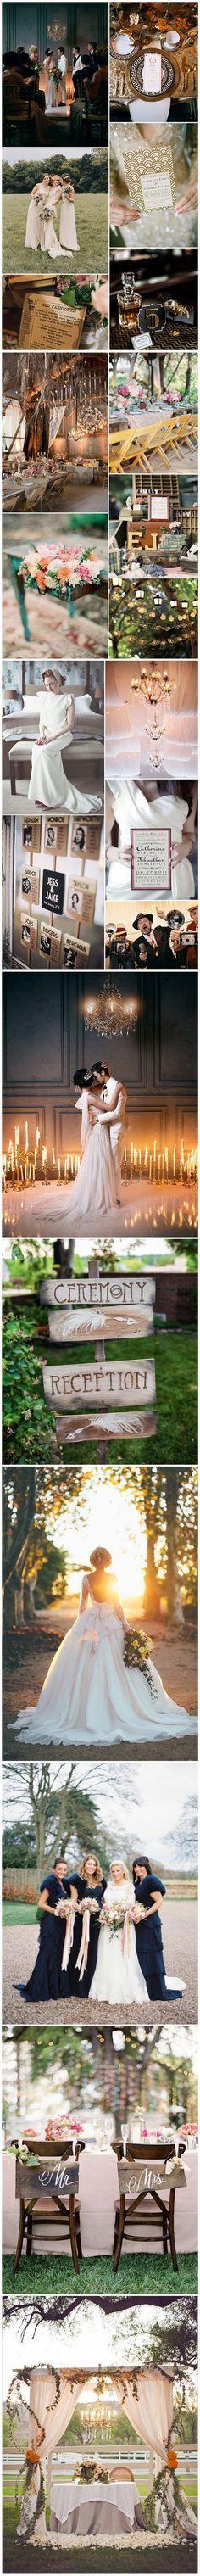 Wedding Trends 2015 - and vintage wedding ideas Prohibition Wedding, Gatsby Wedding, Wedding Couples, Our Wedding, Fall Wedding, Rustic Wedding, Dream Wedding, Cyprus Wedding, Wedding Vintage